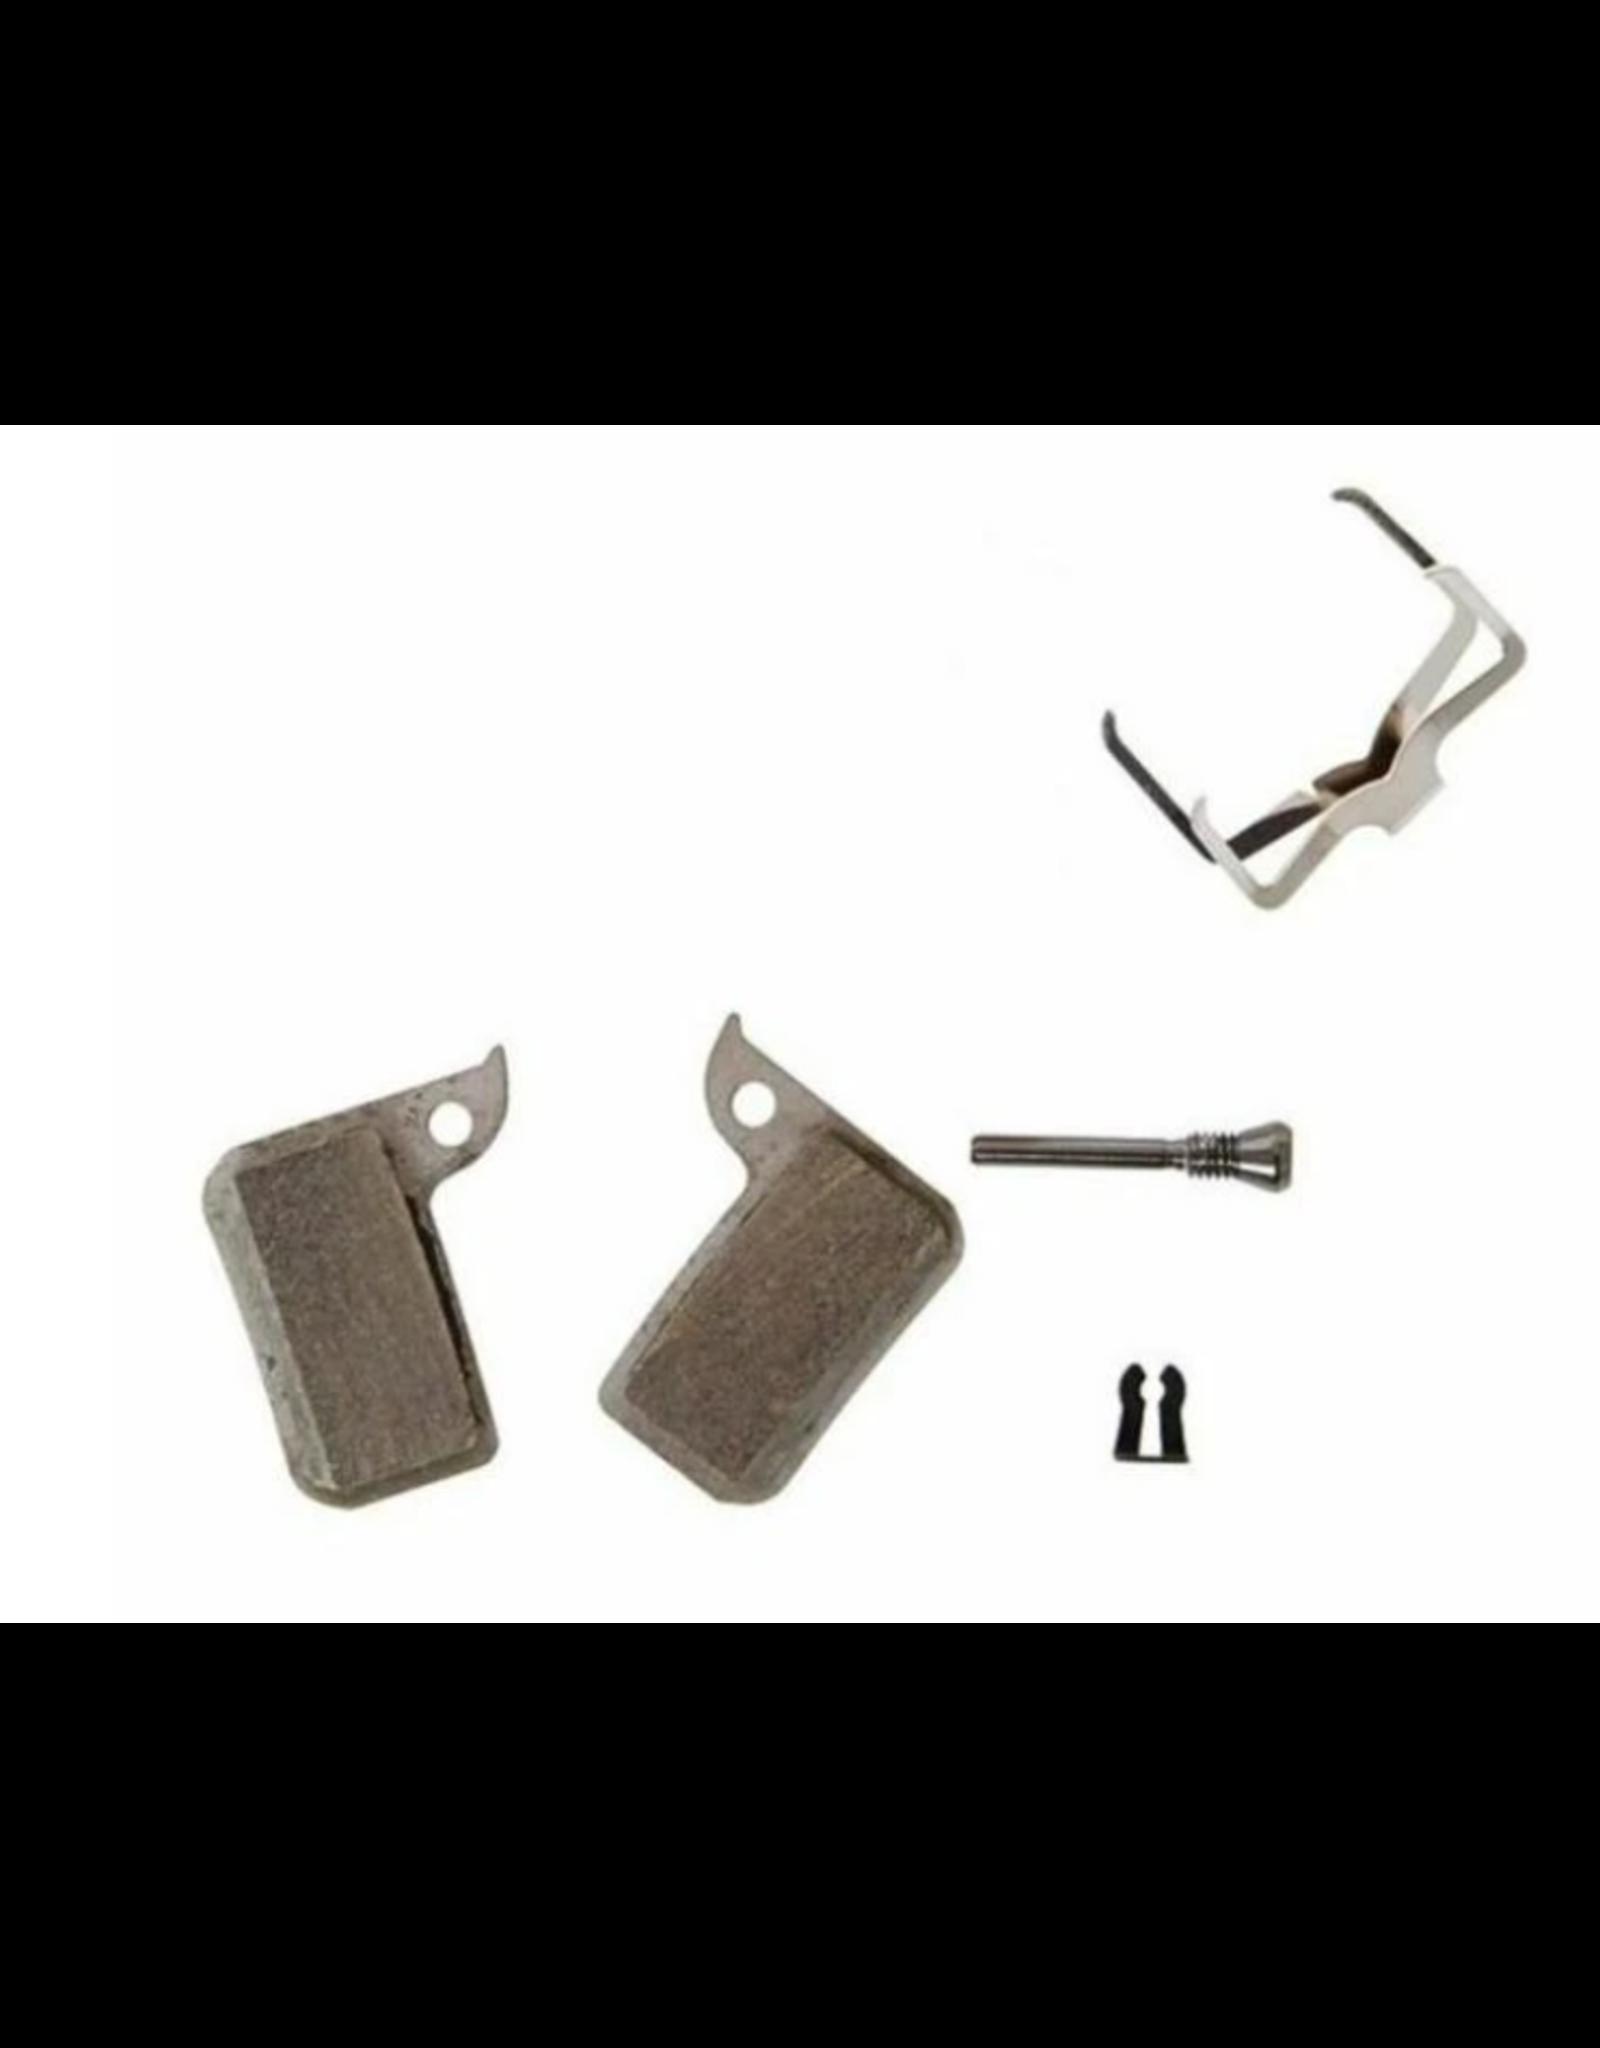 SRAM SRAM, level  TLM, level Ultimate, HRD, Disc Brake Pads, Shape: SRAM HRD/level TLM, Metallic, Pair